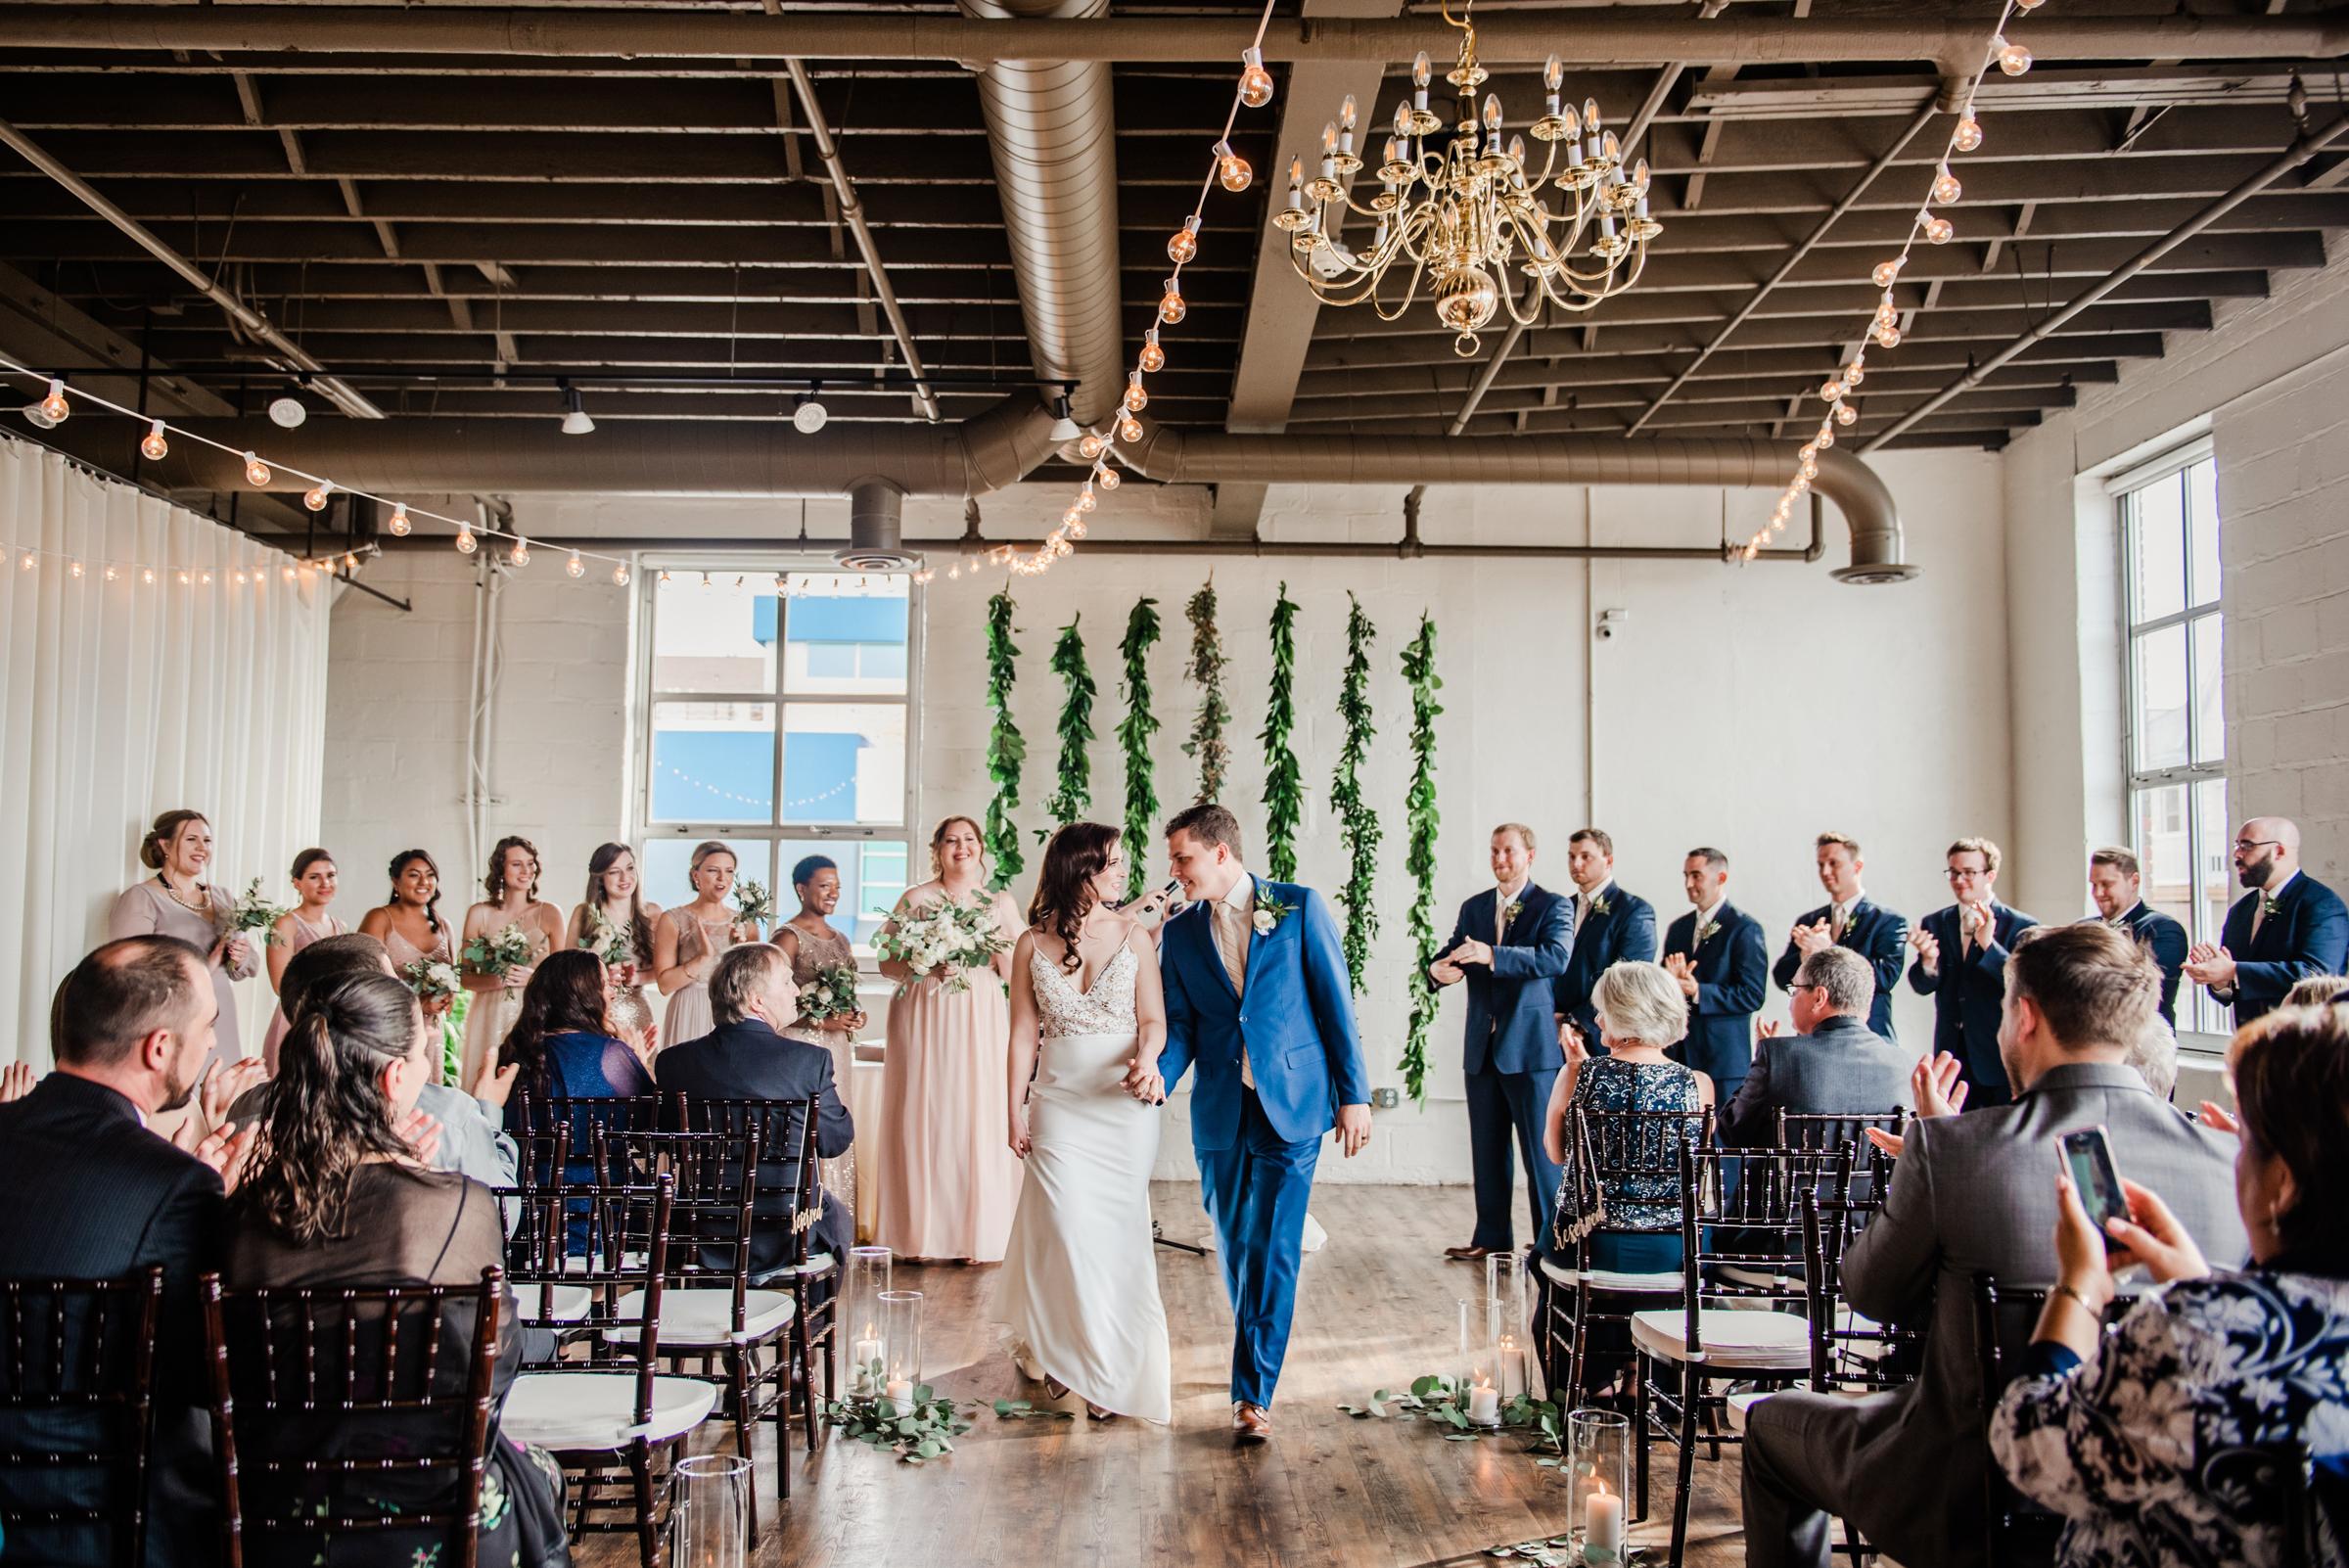 The_Arbor_LoftRochester_Wedding_JILL_STUDIO_Rochester_NY_Photographer_171709.jpg